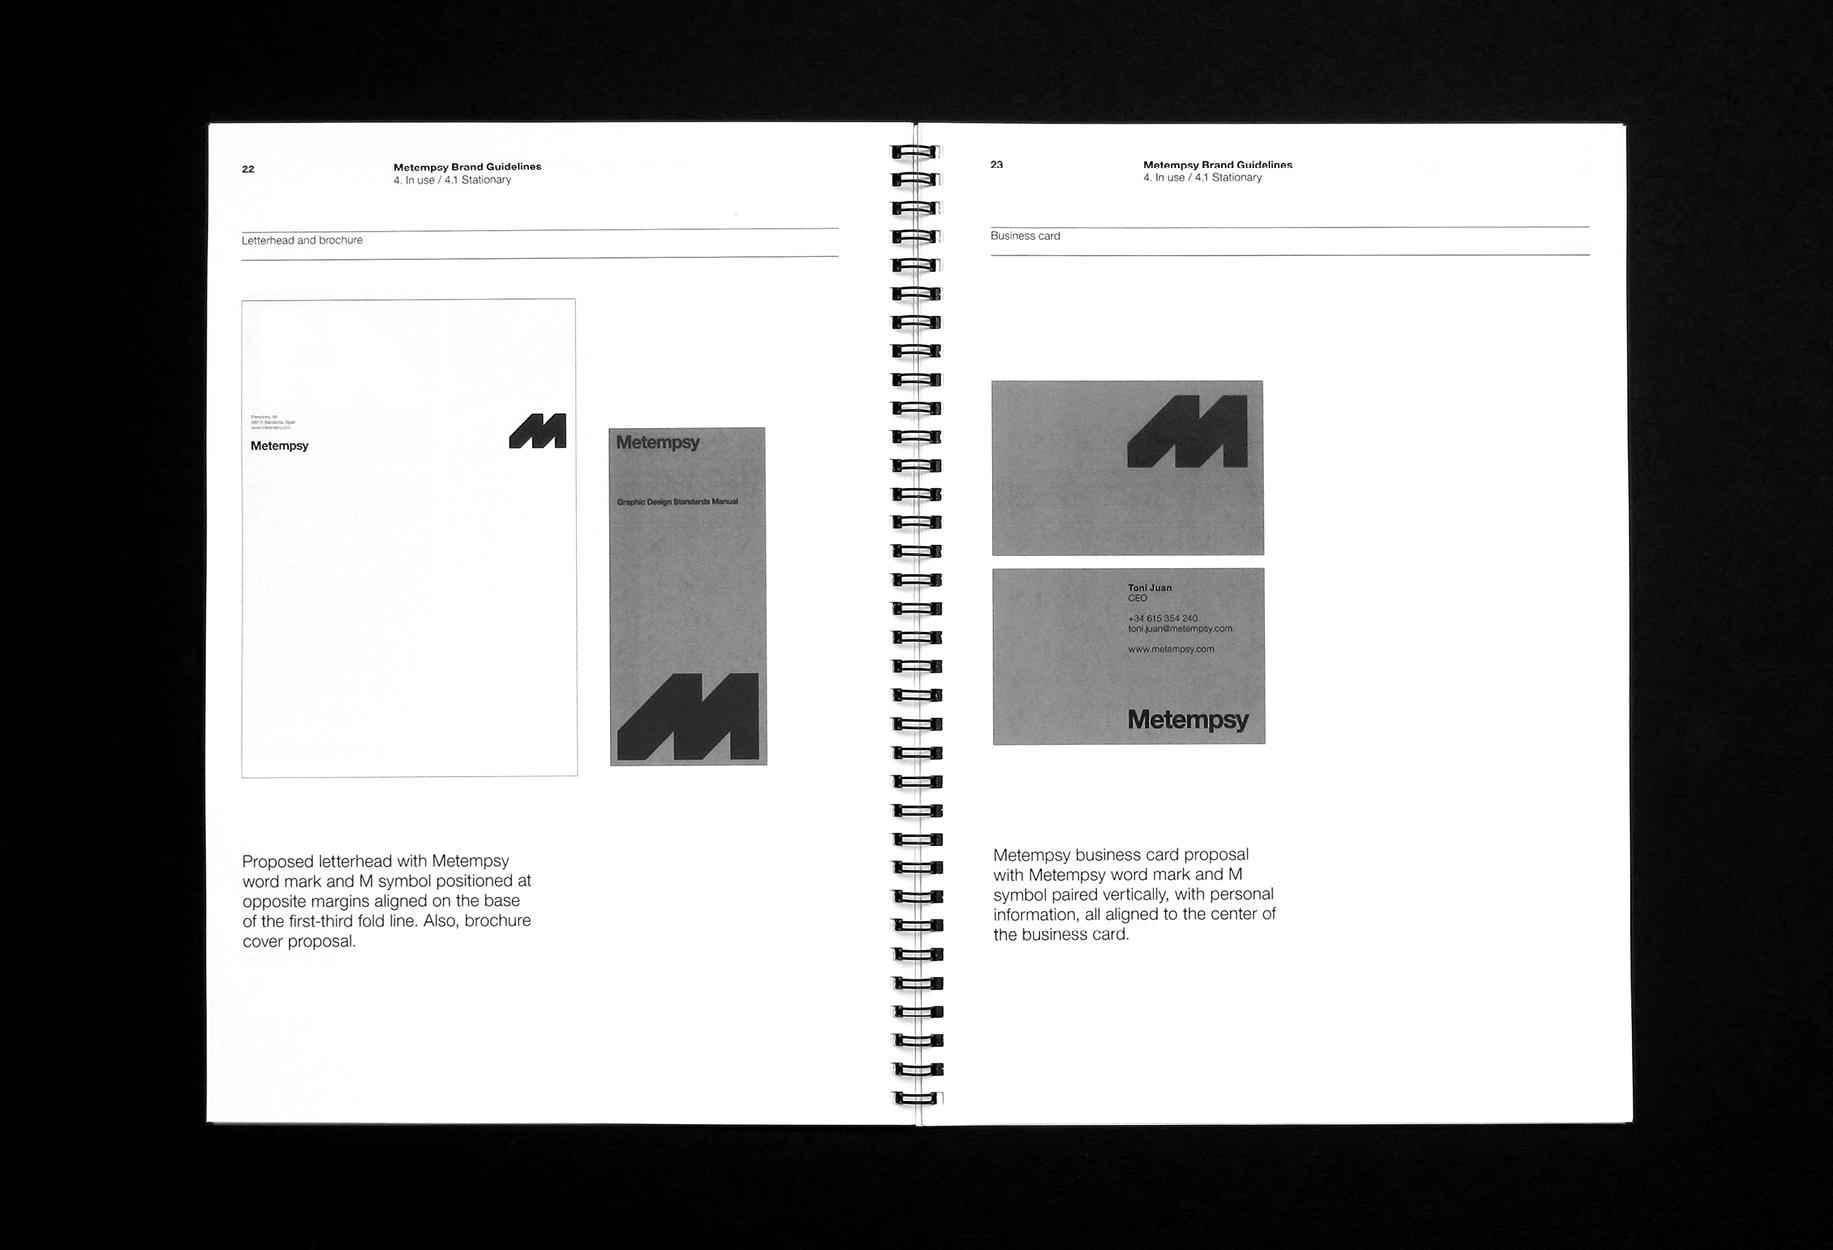 Metempsy-Graphic-Design-Standards-Manual-12.jpg